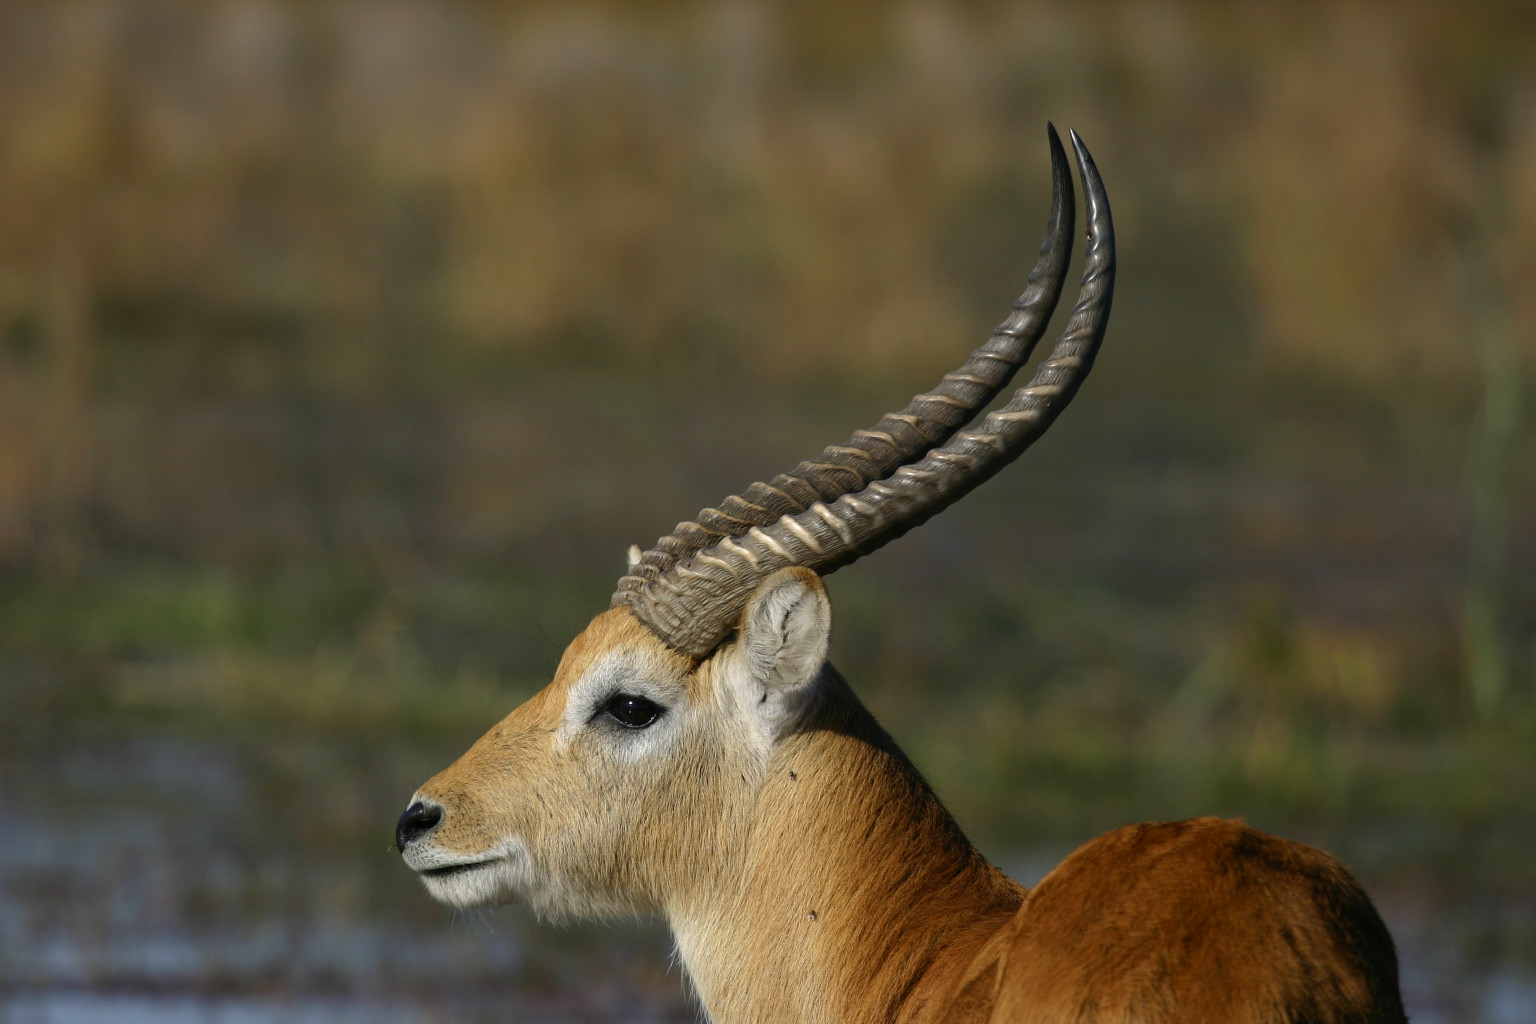 Wild Deer, Animal, Deer, Jungle, Nature, HQ Photo